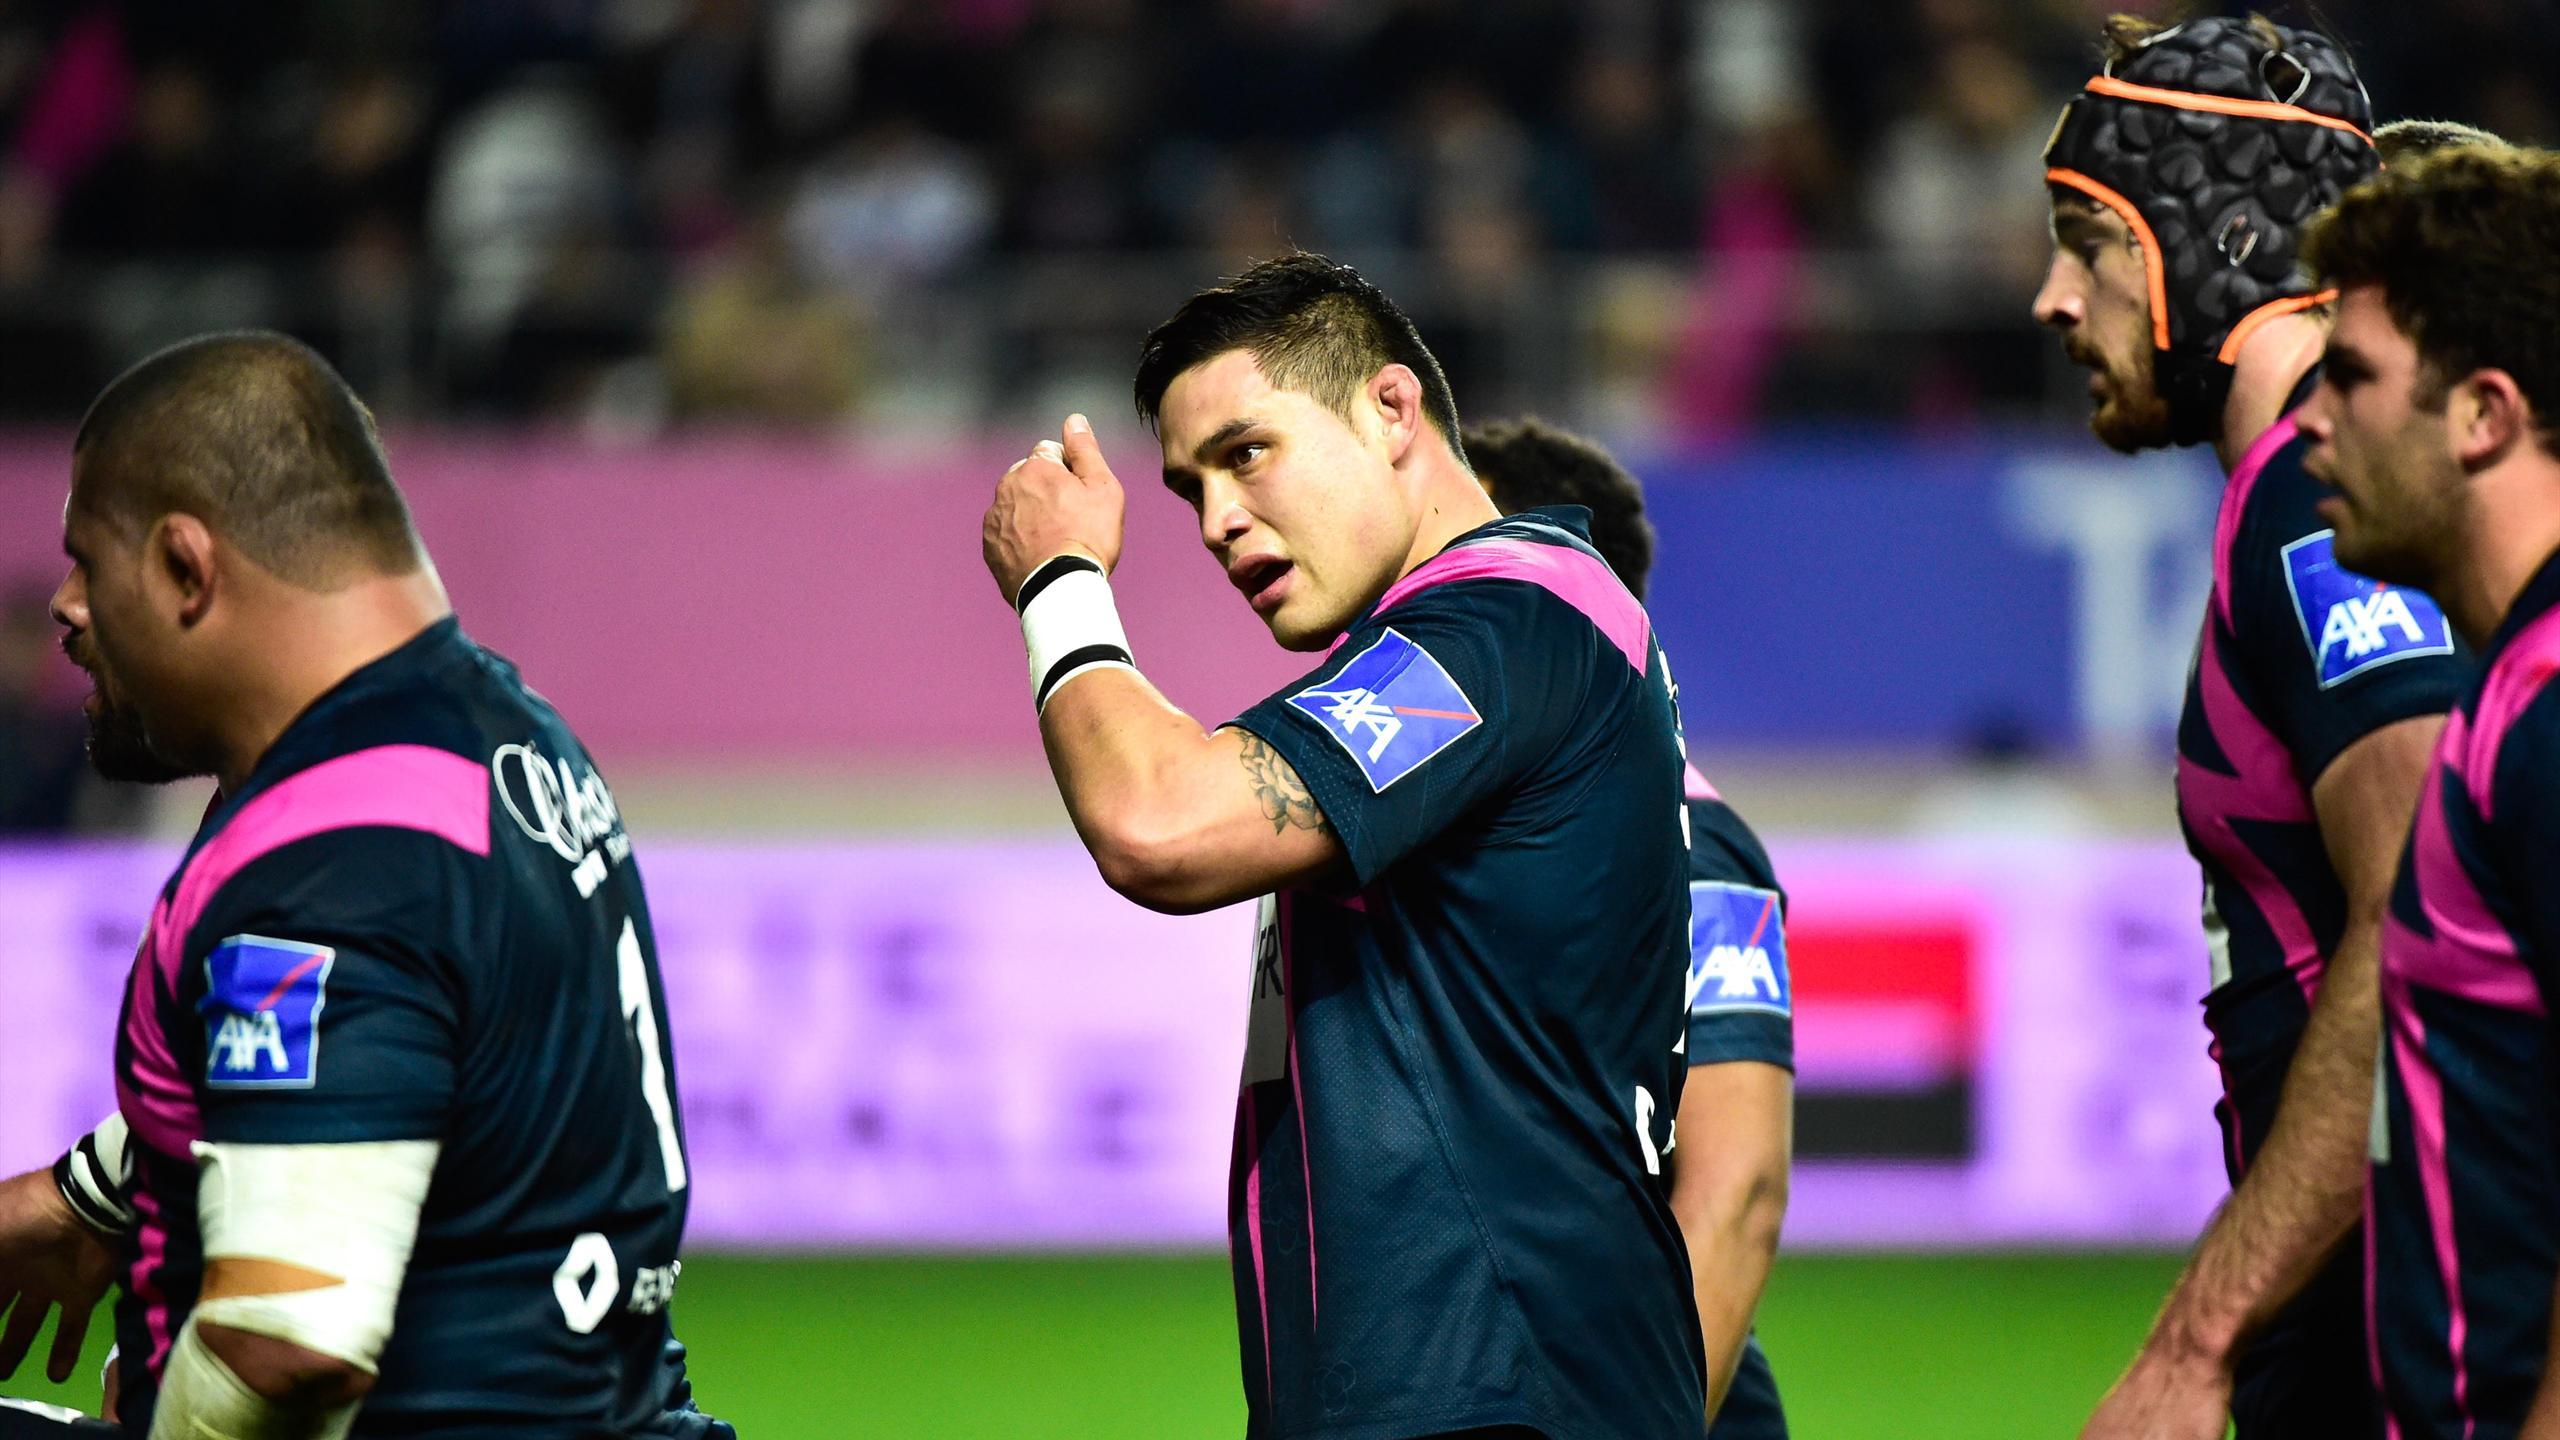 Raphaël Lakafia (Stade français)